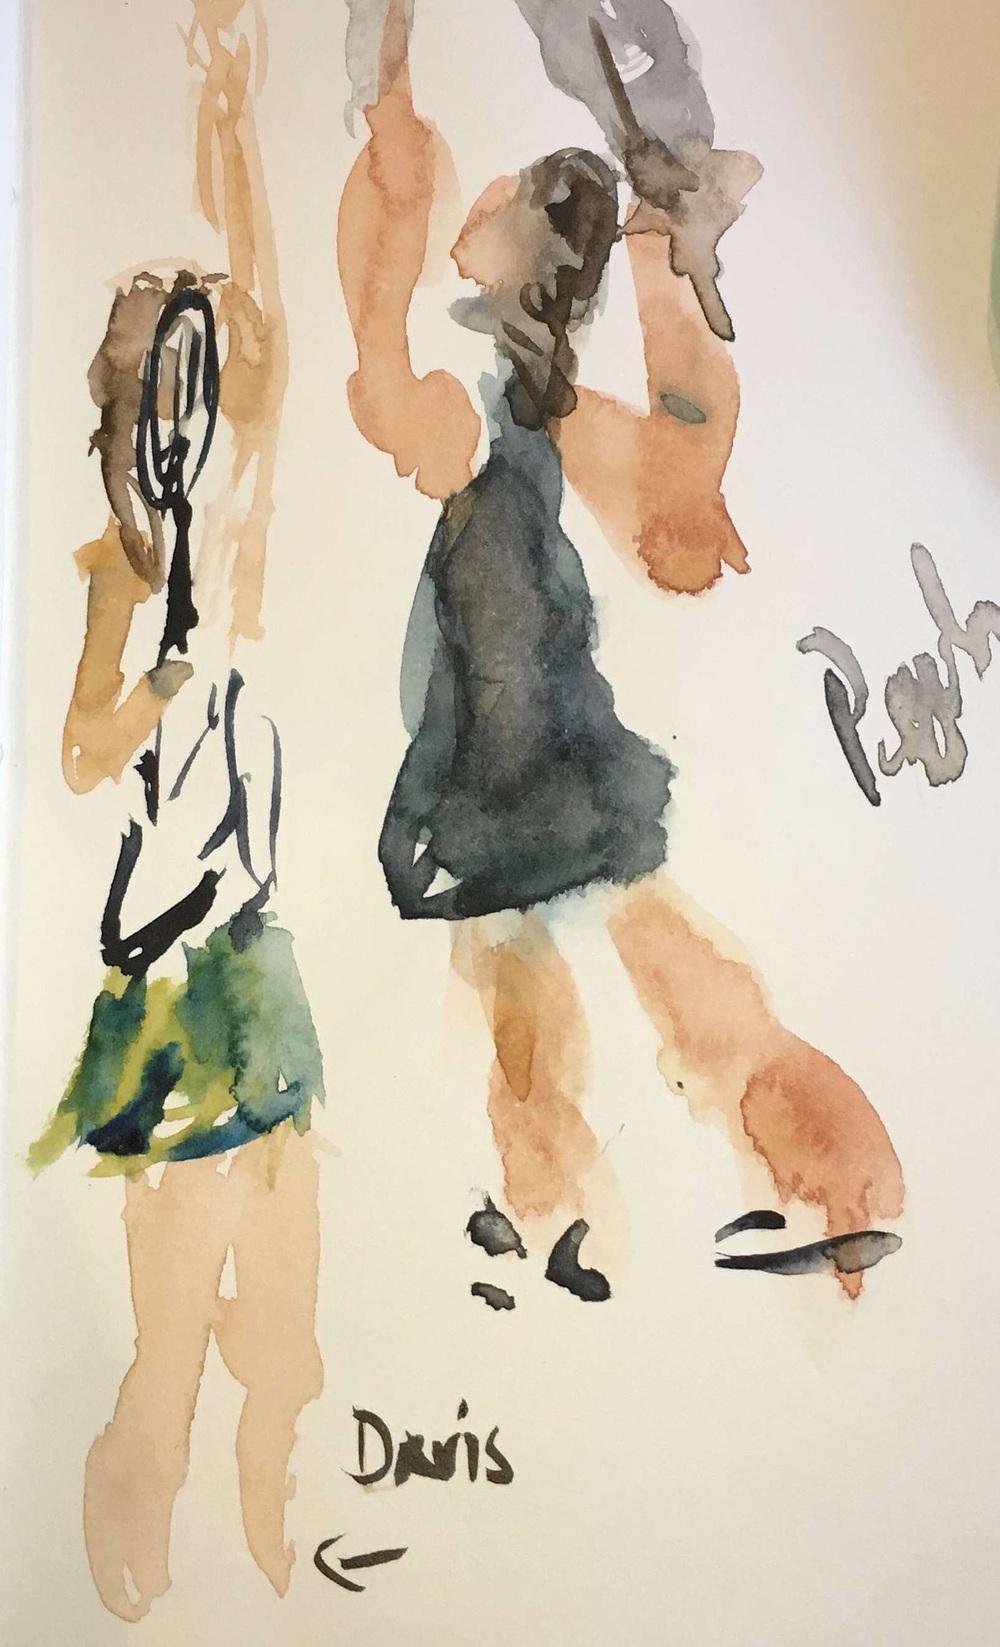 Davis & Pegula hitting serves in watercolor